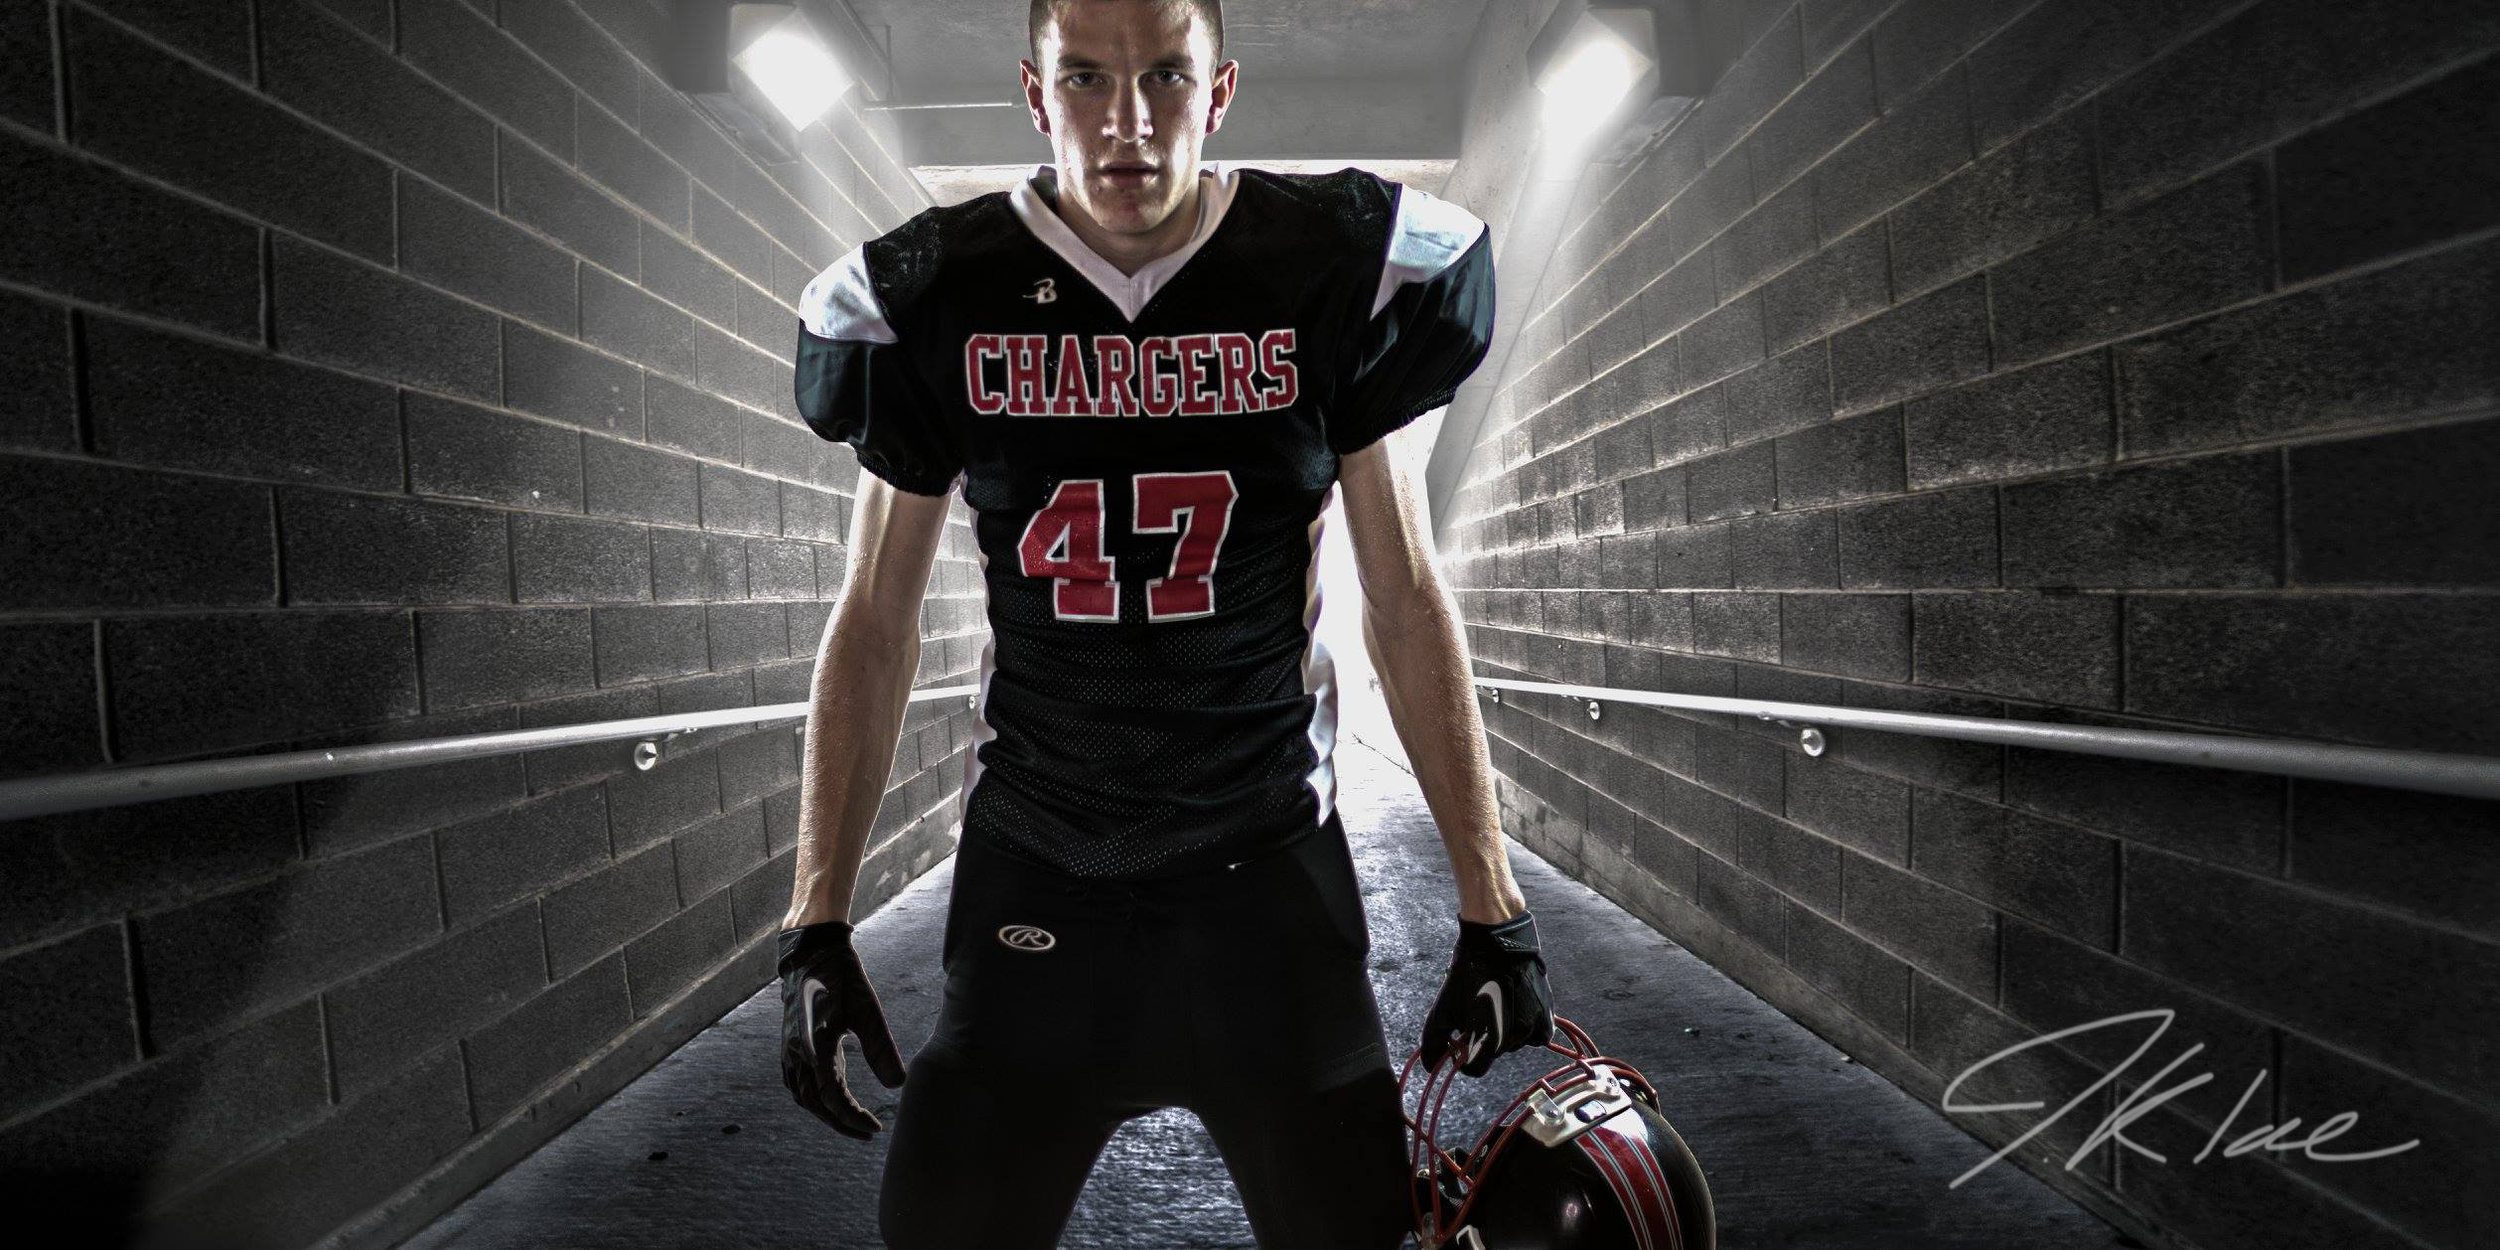 McKinney Texas Boys HDR Athletic Football Senior Portrait in Tunnel